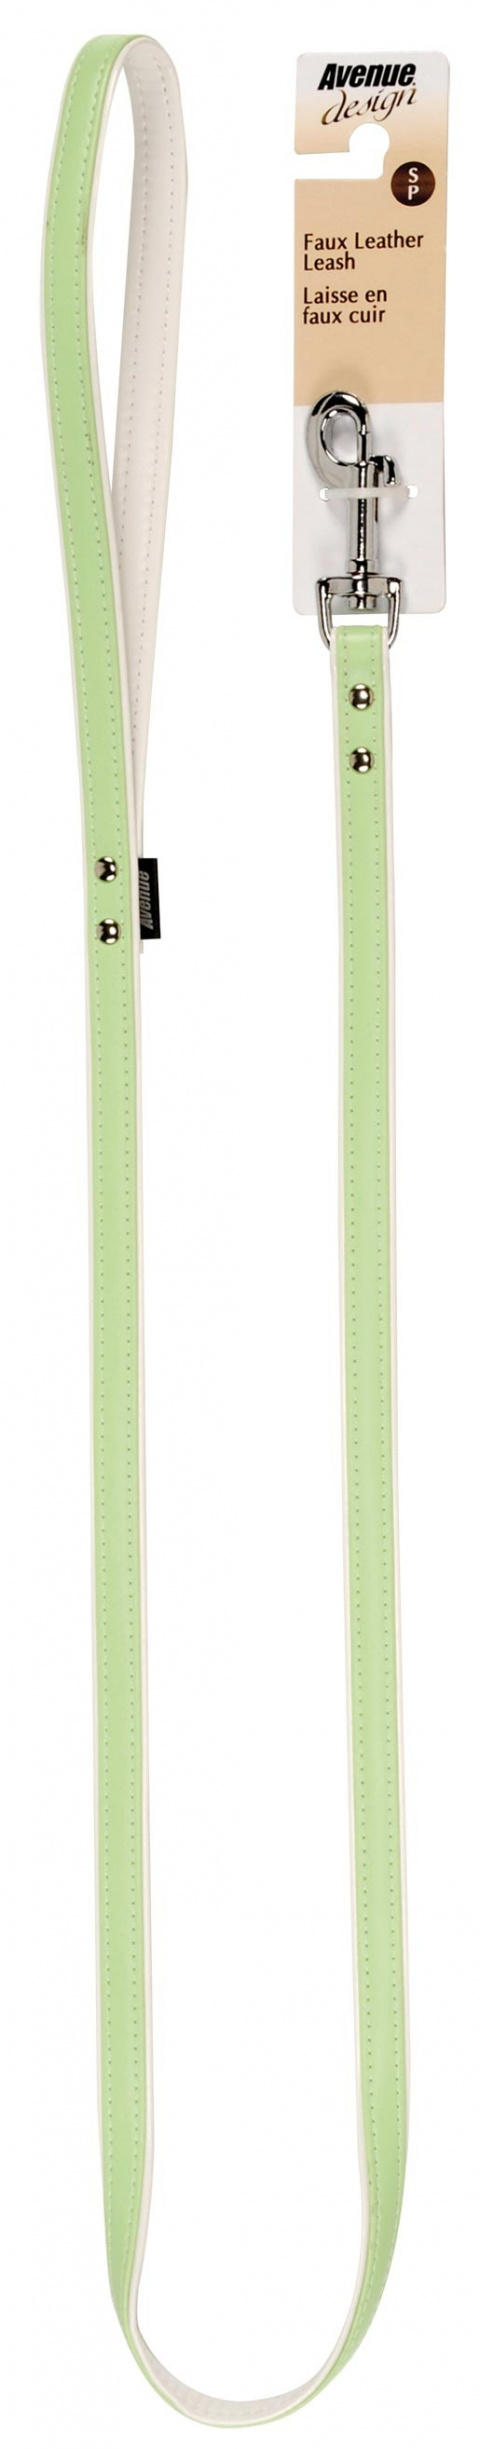 Vodítko AVENUE Elegance zelené 110 x 1,4 cm